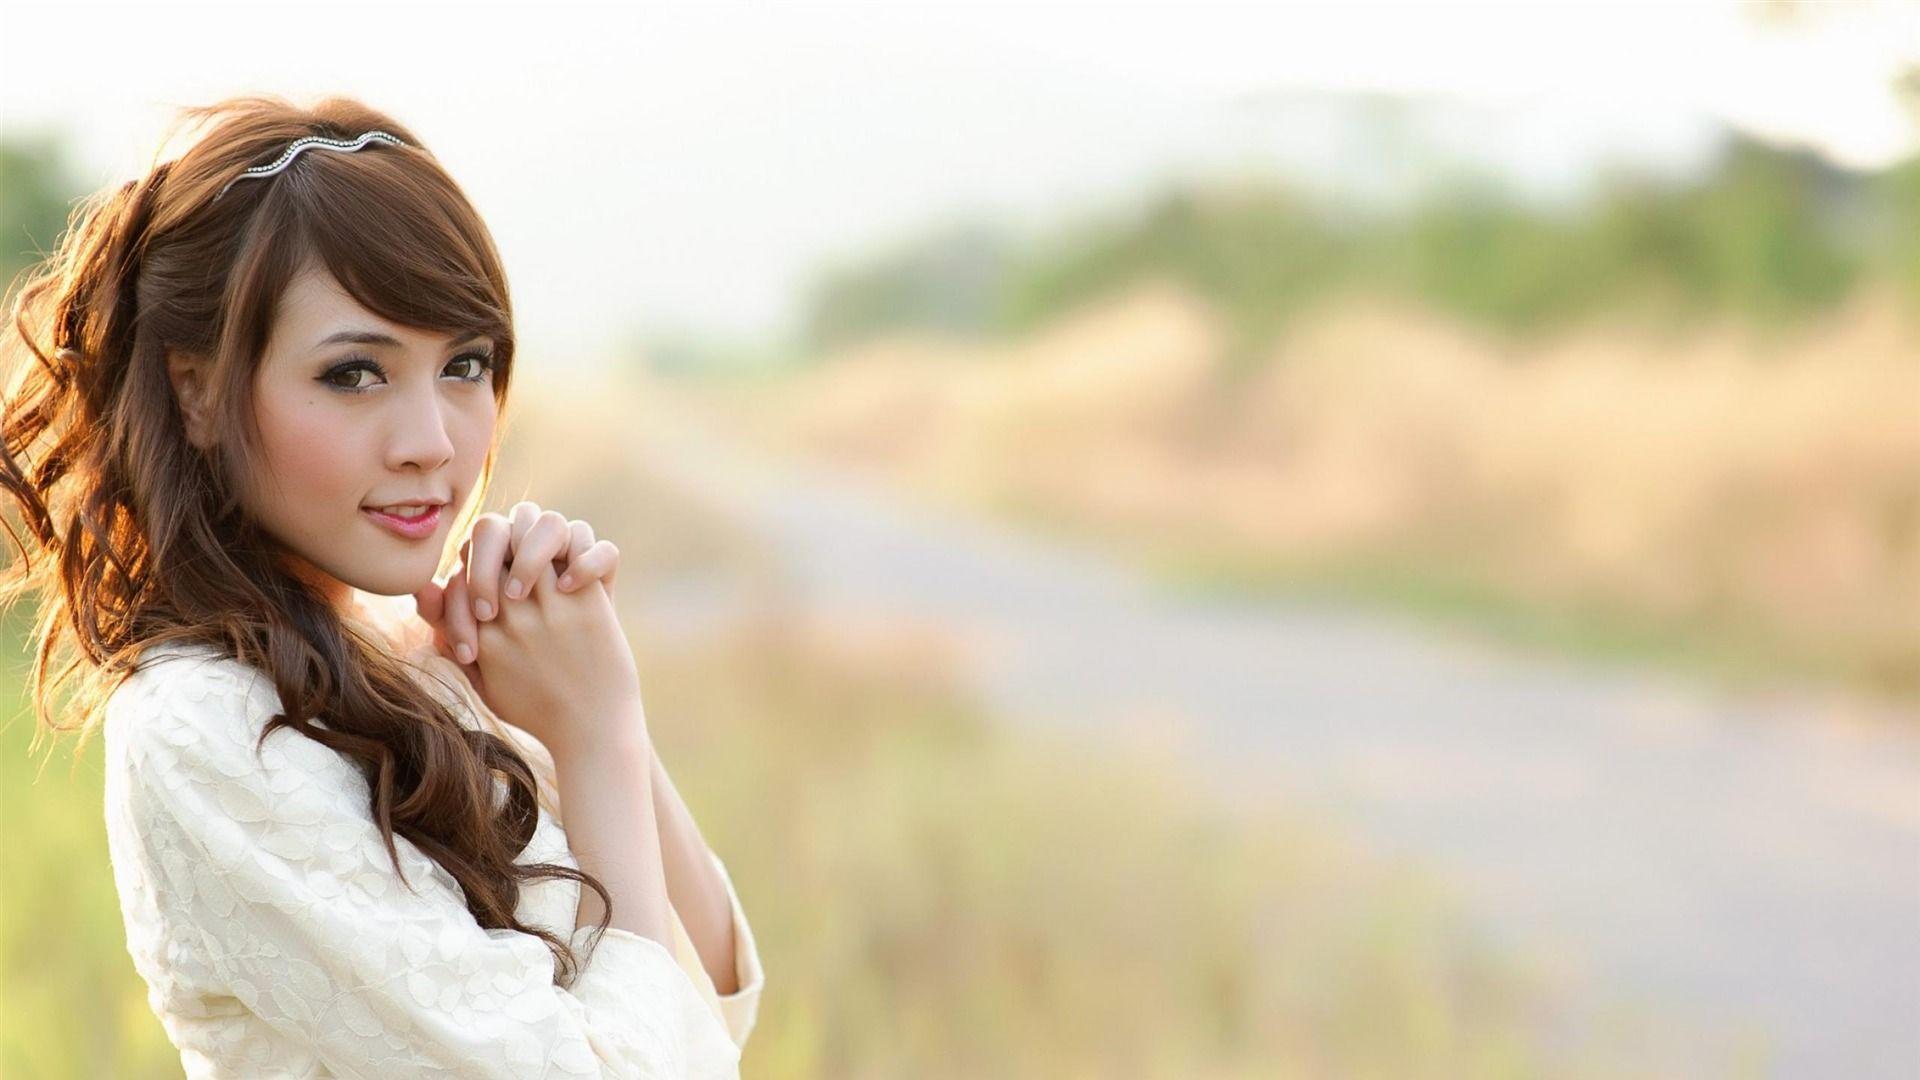 Asian Girl Wallpaper - Cute Girl Background , HD Wallpaper & Backgrounds